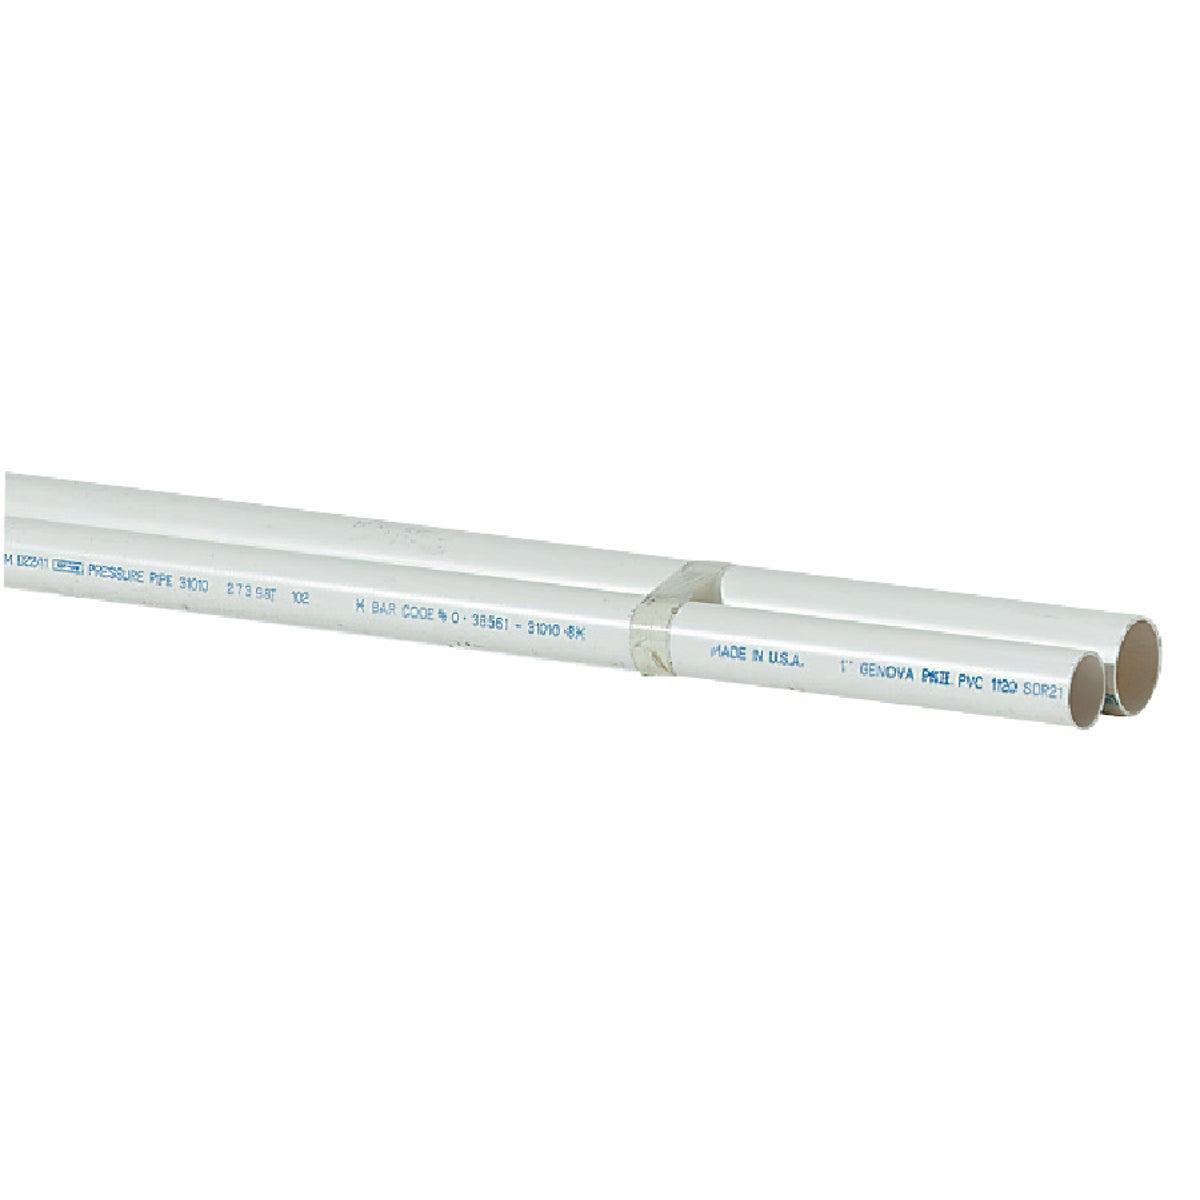 "11/4""X10' SDR26 PVC PIPE"